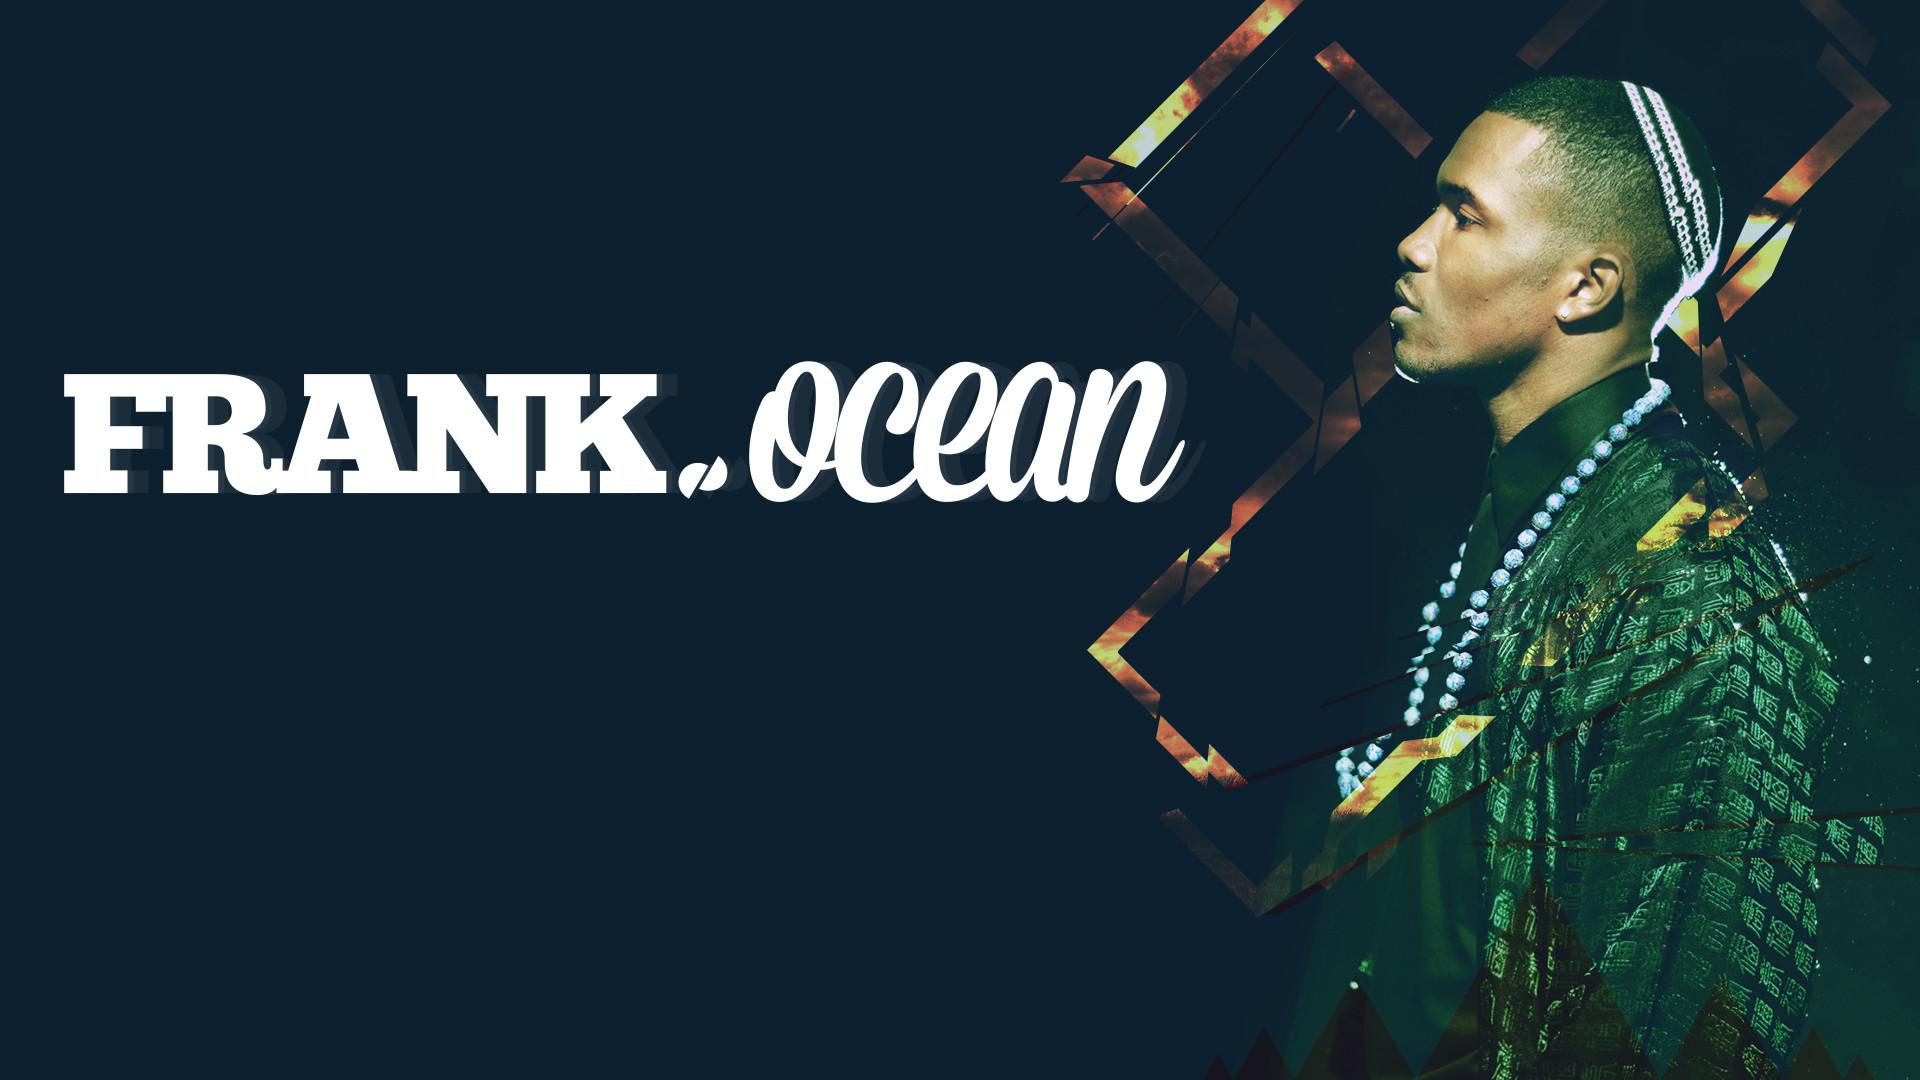 Frank Ocean Wallpapers HD 1920x1080